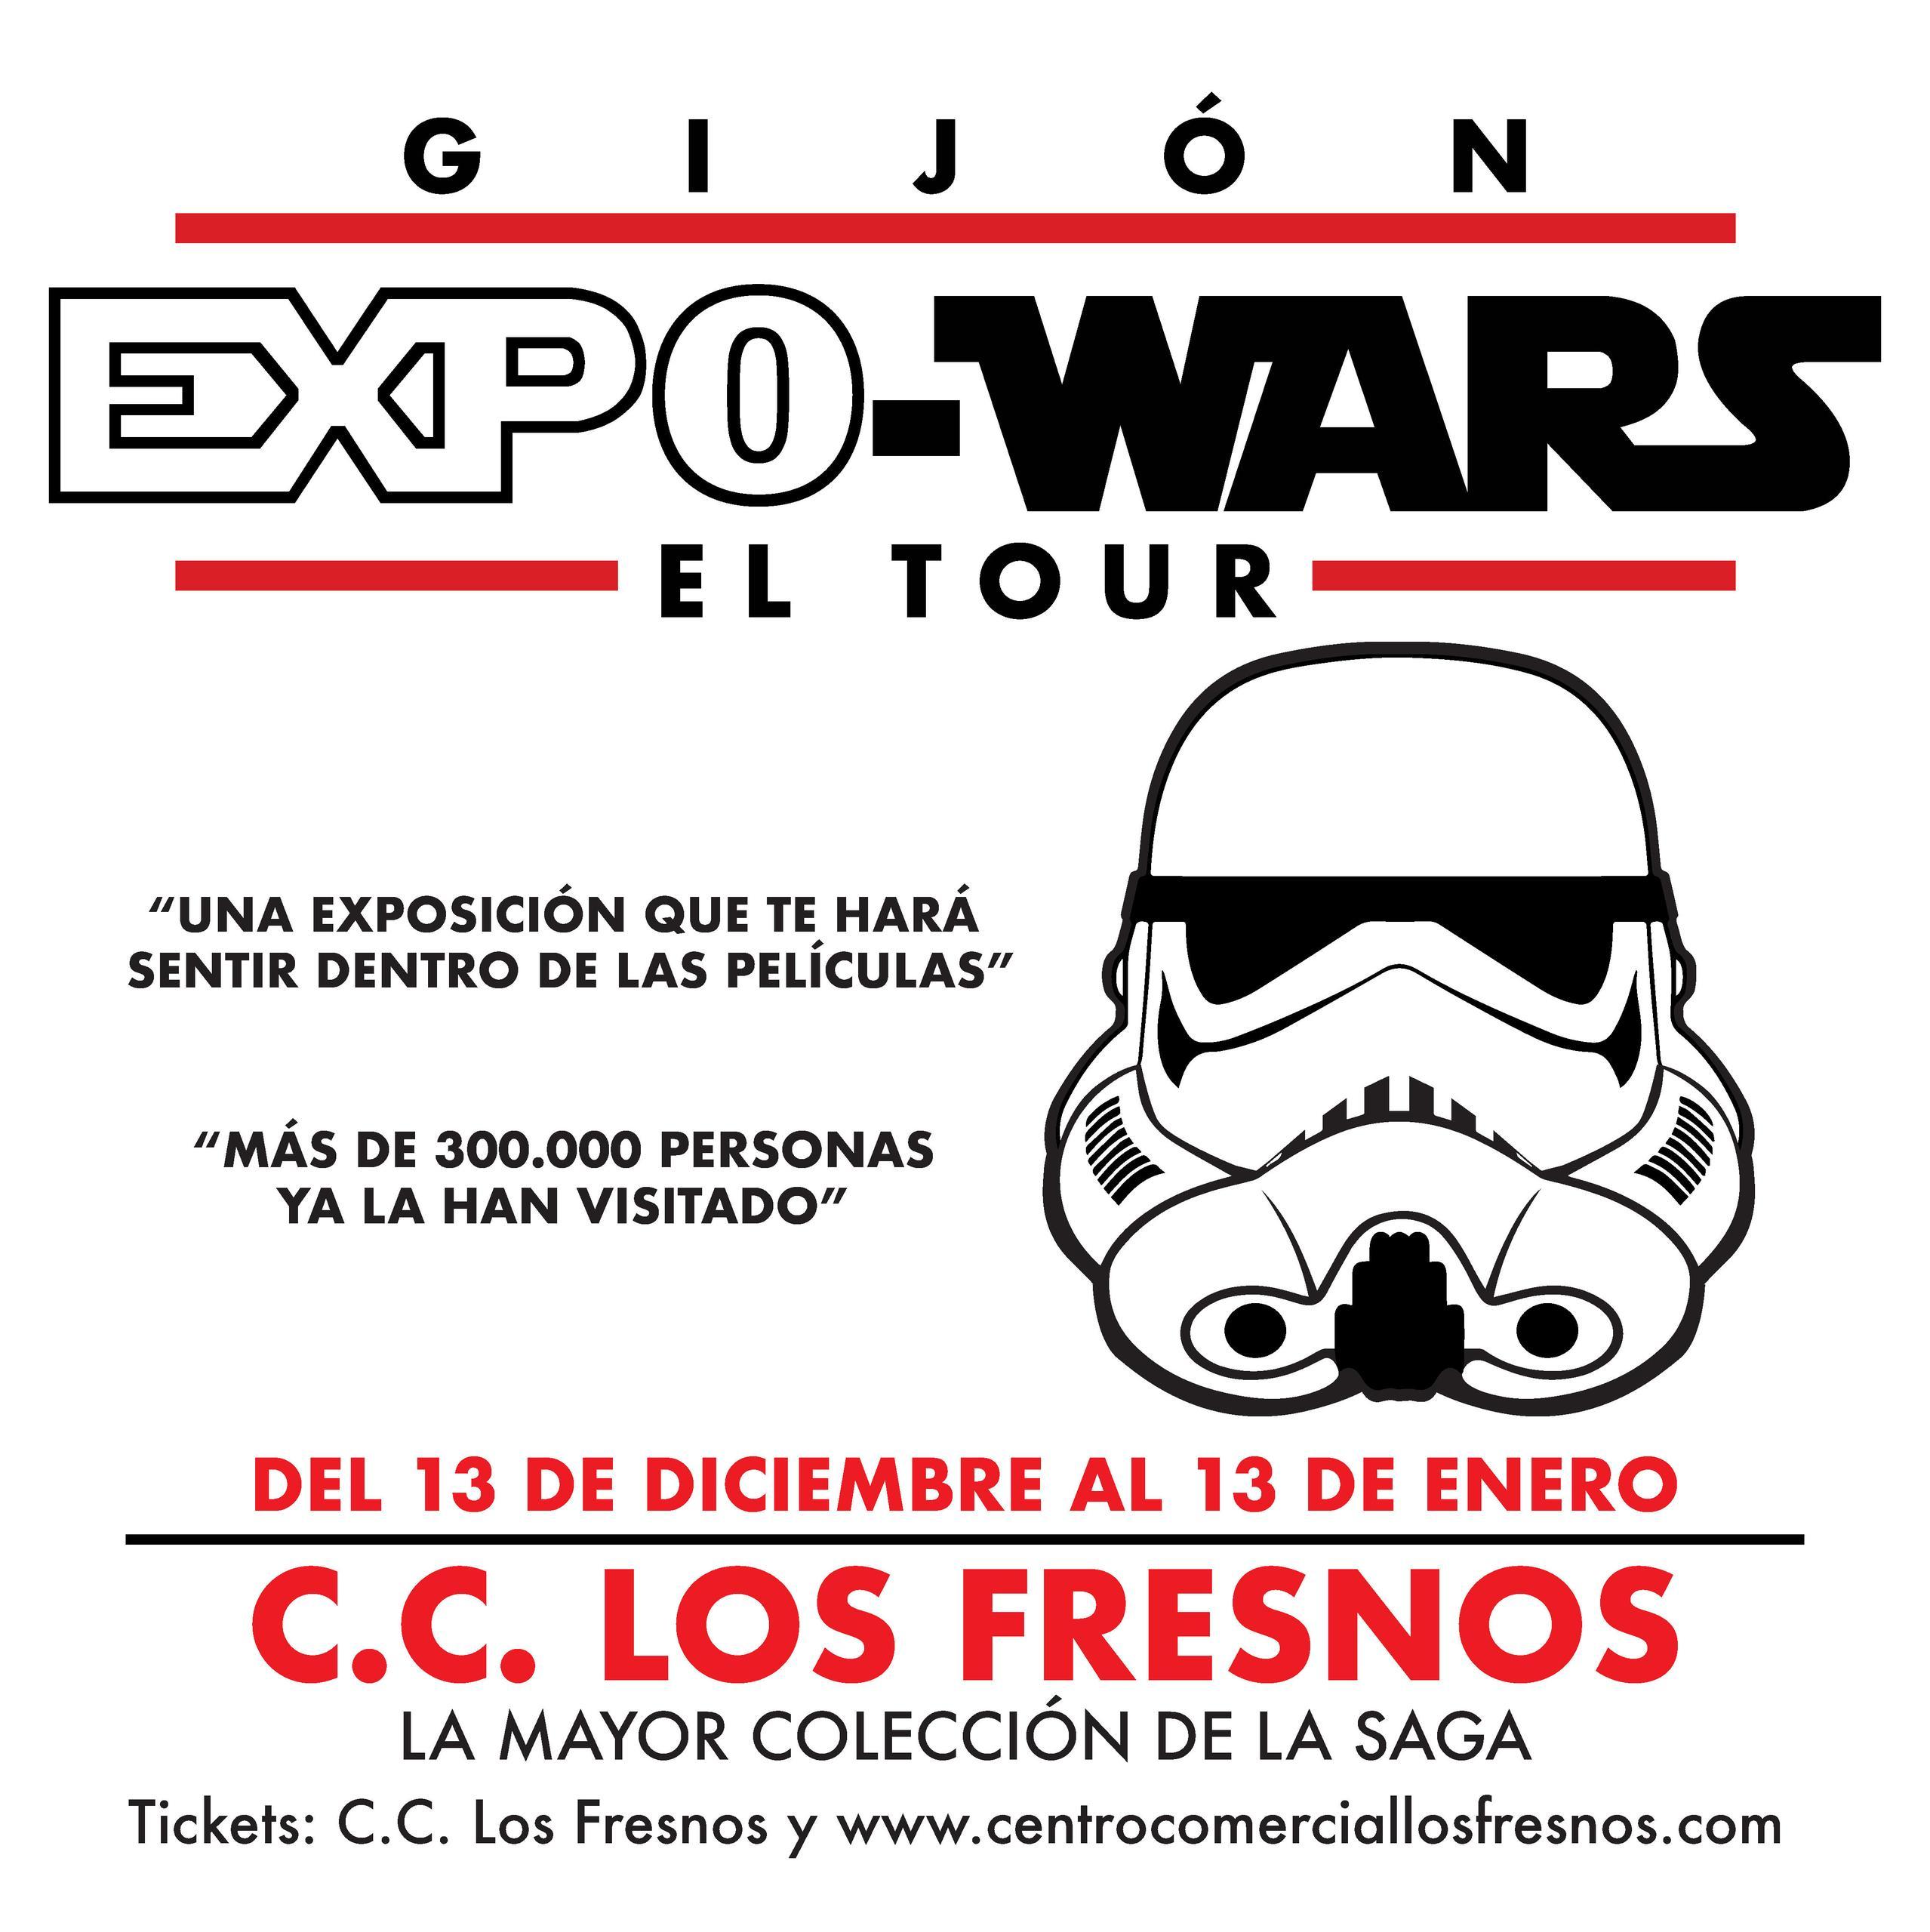 expo wars